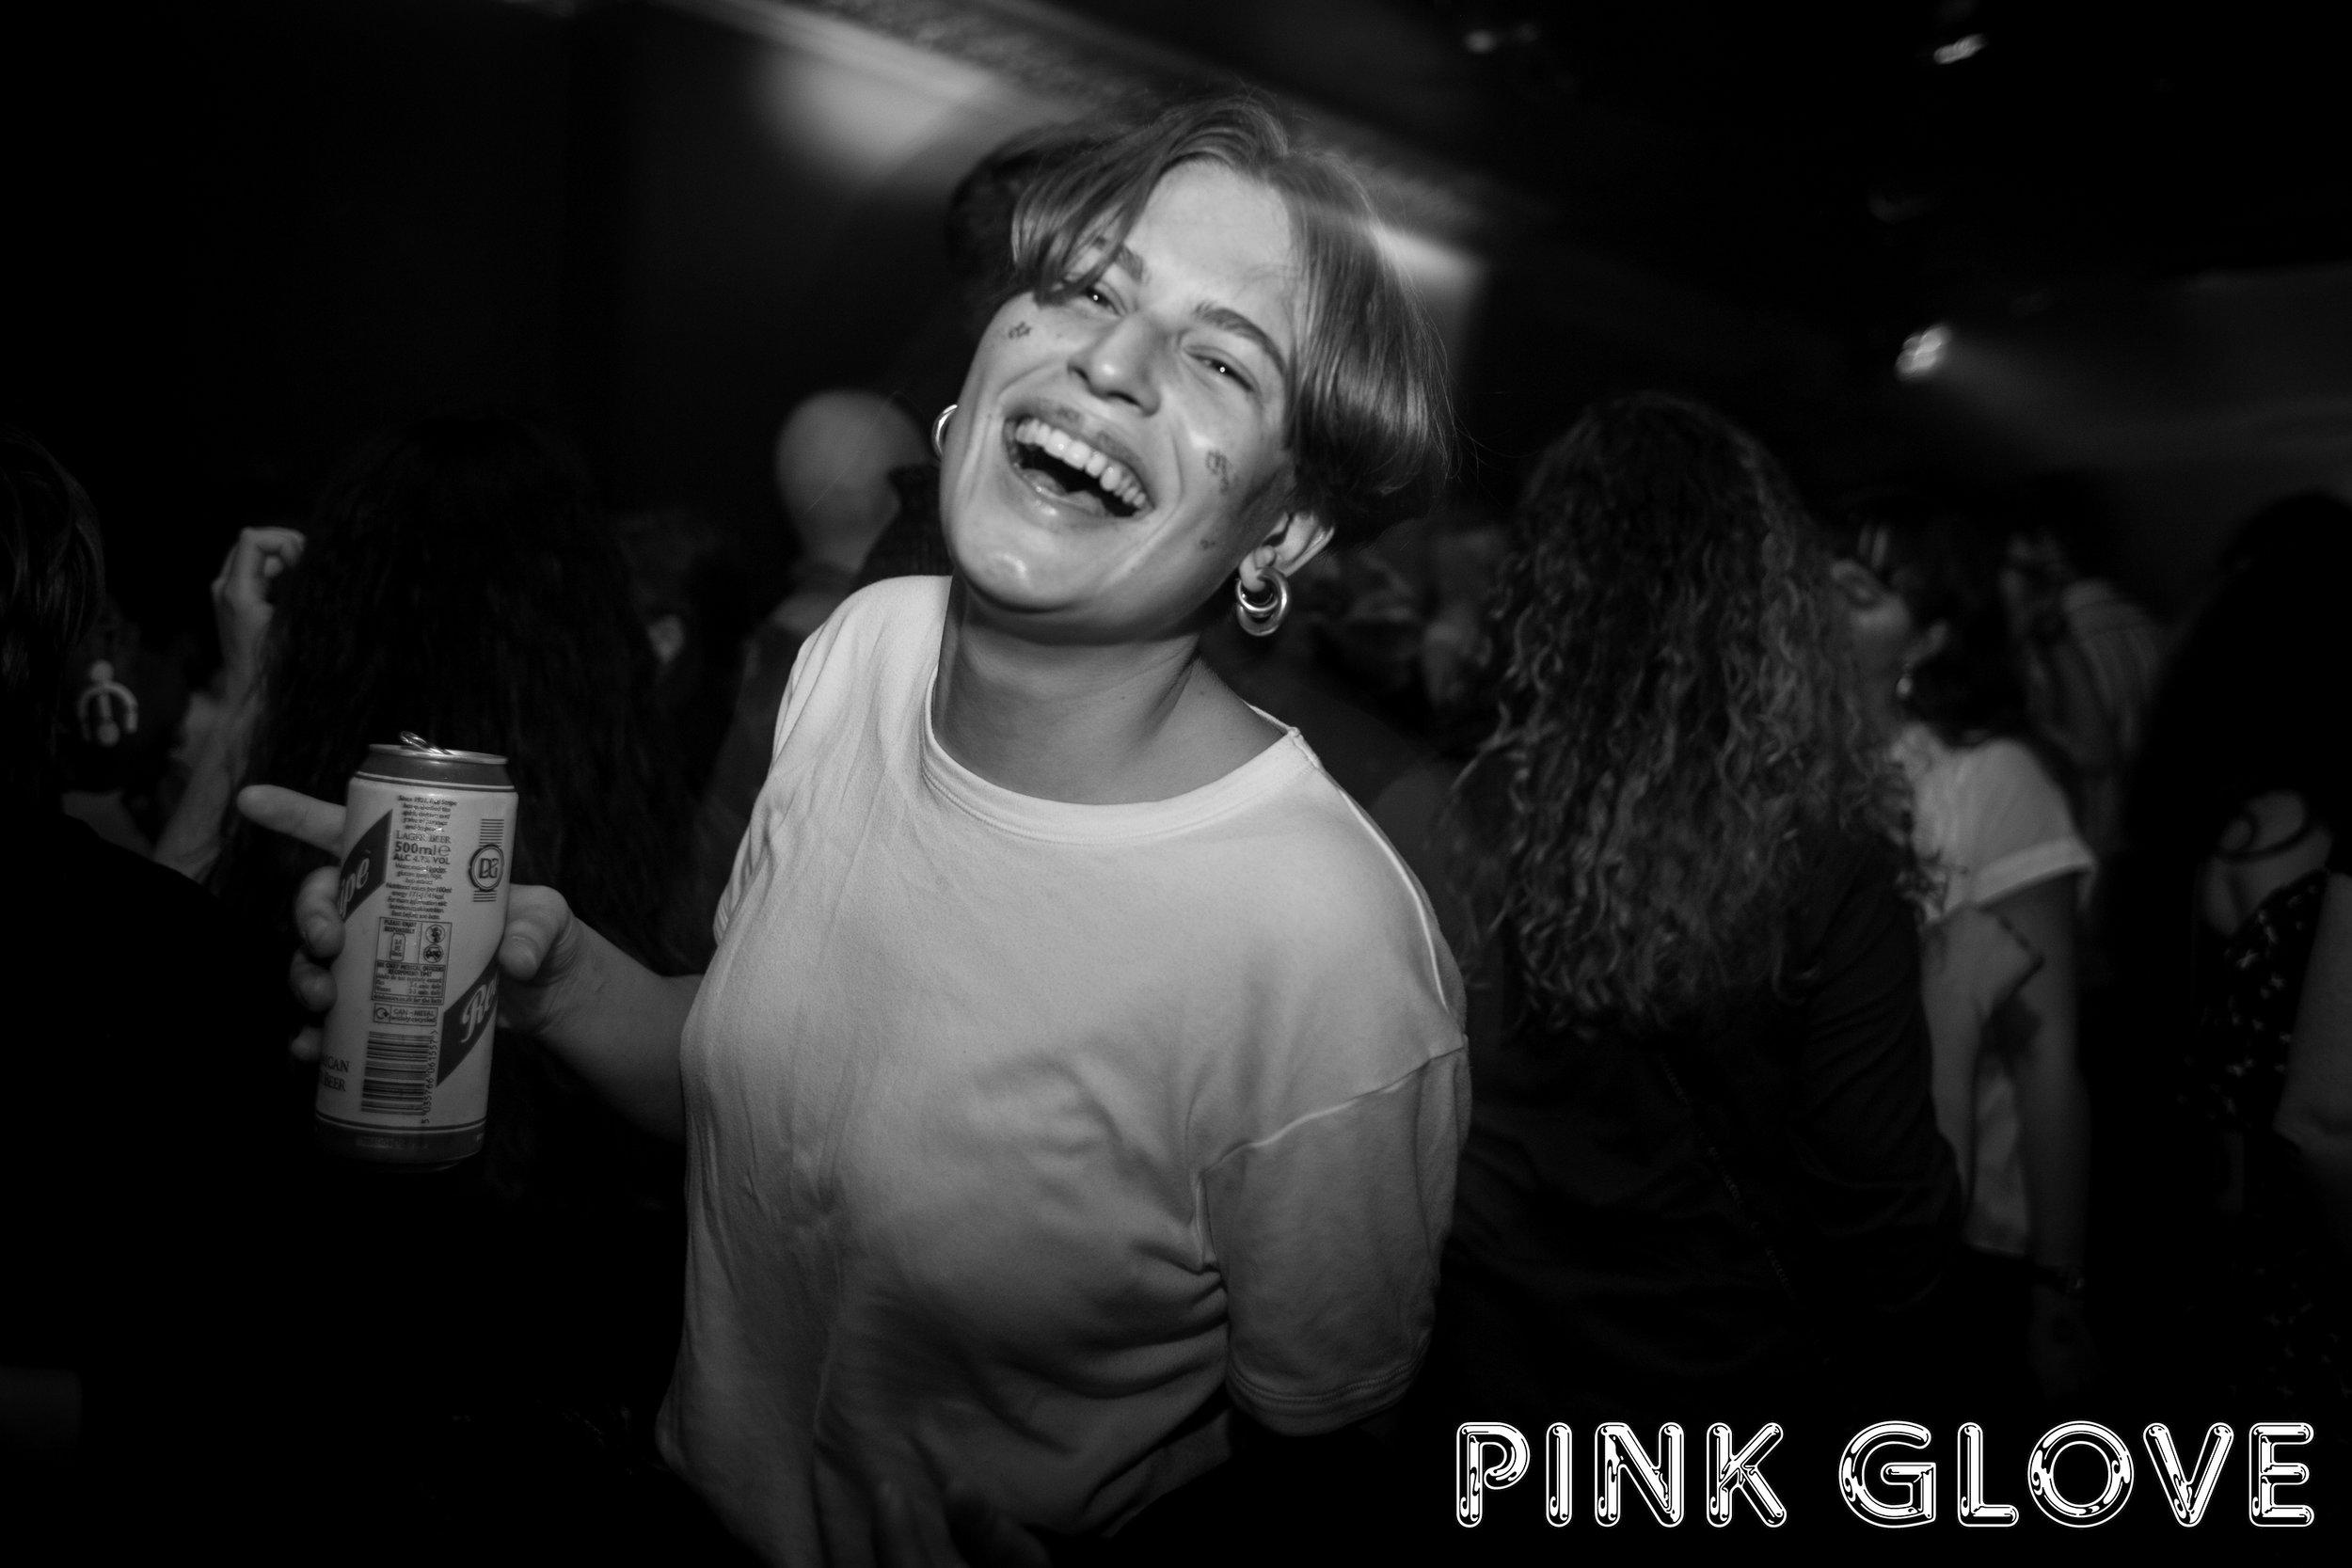 Pink Glove, London 2018